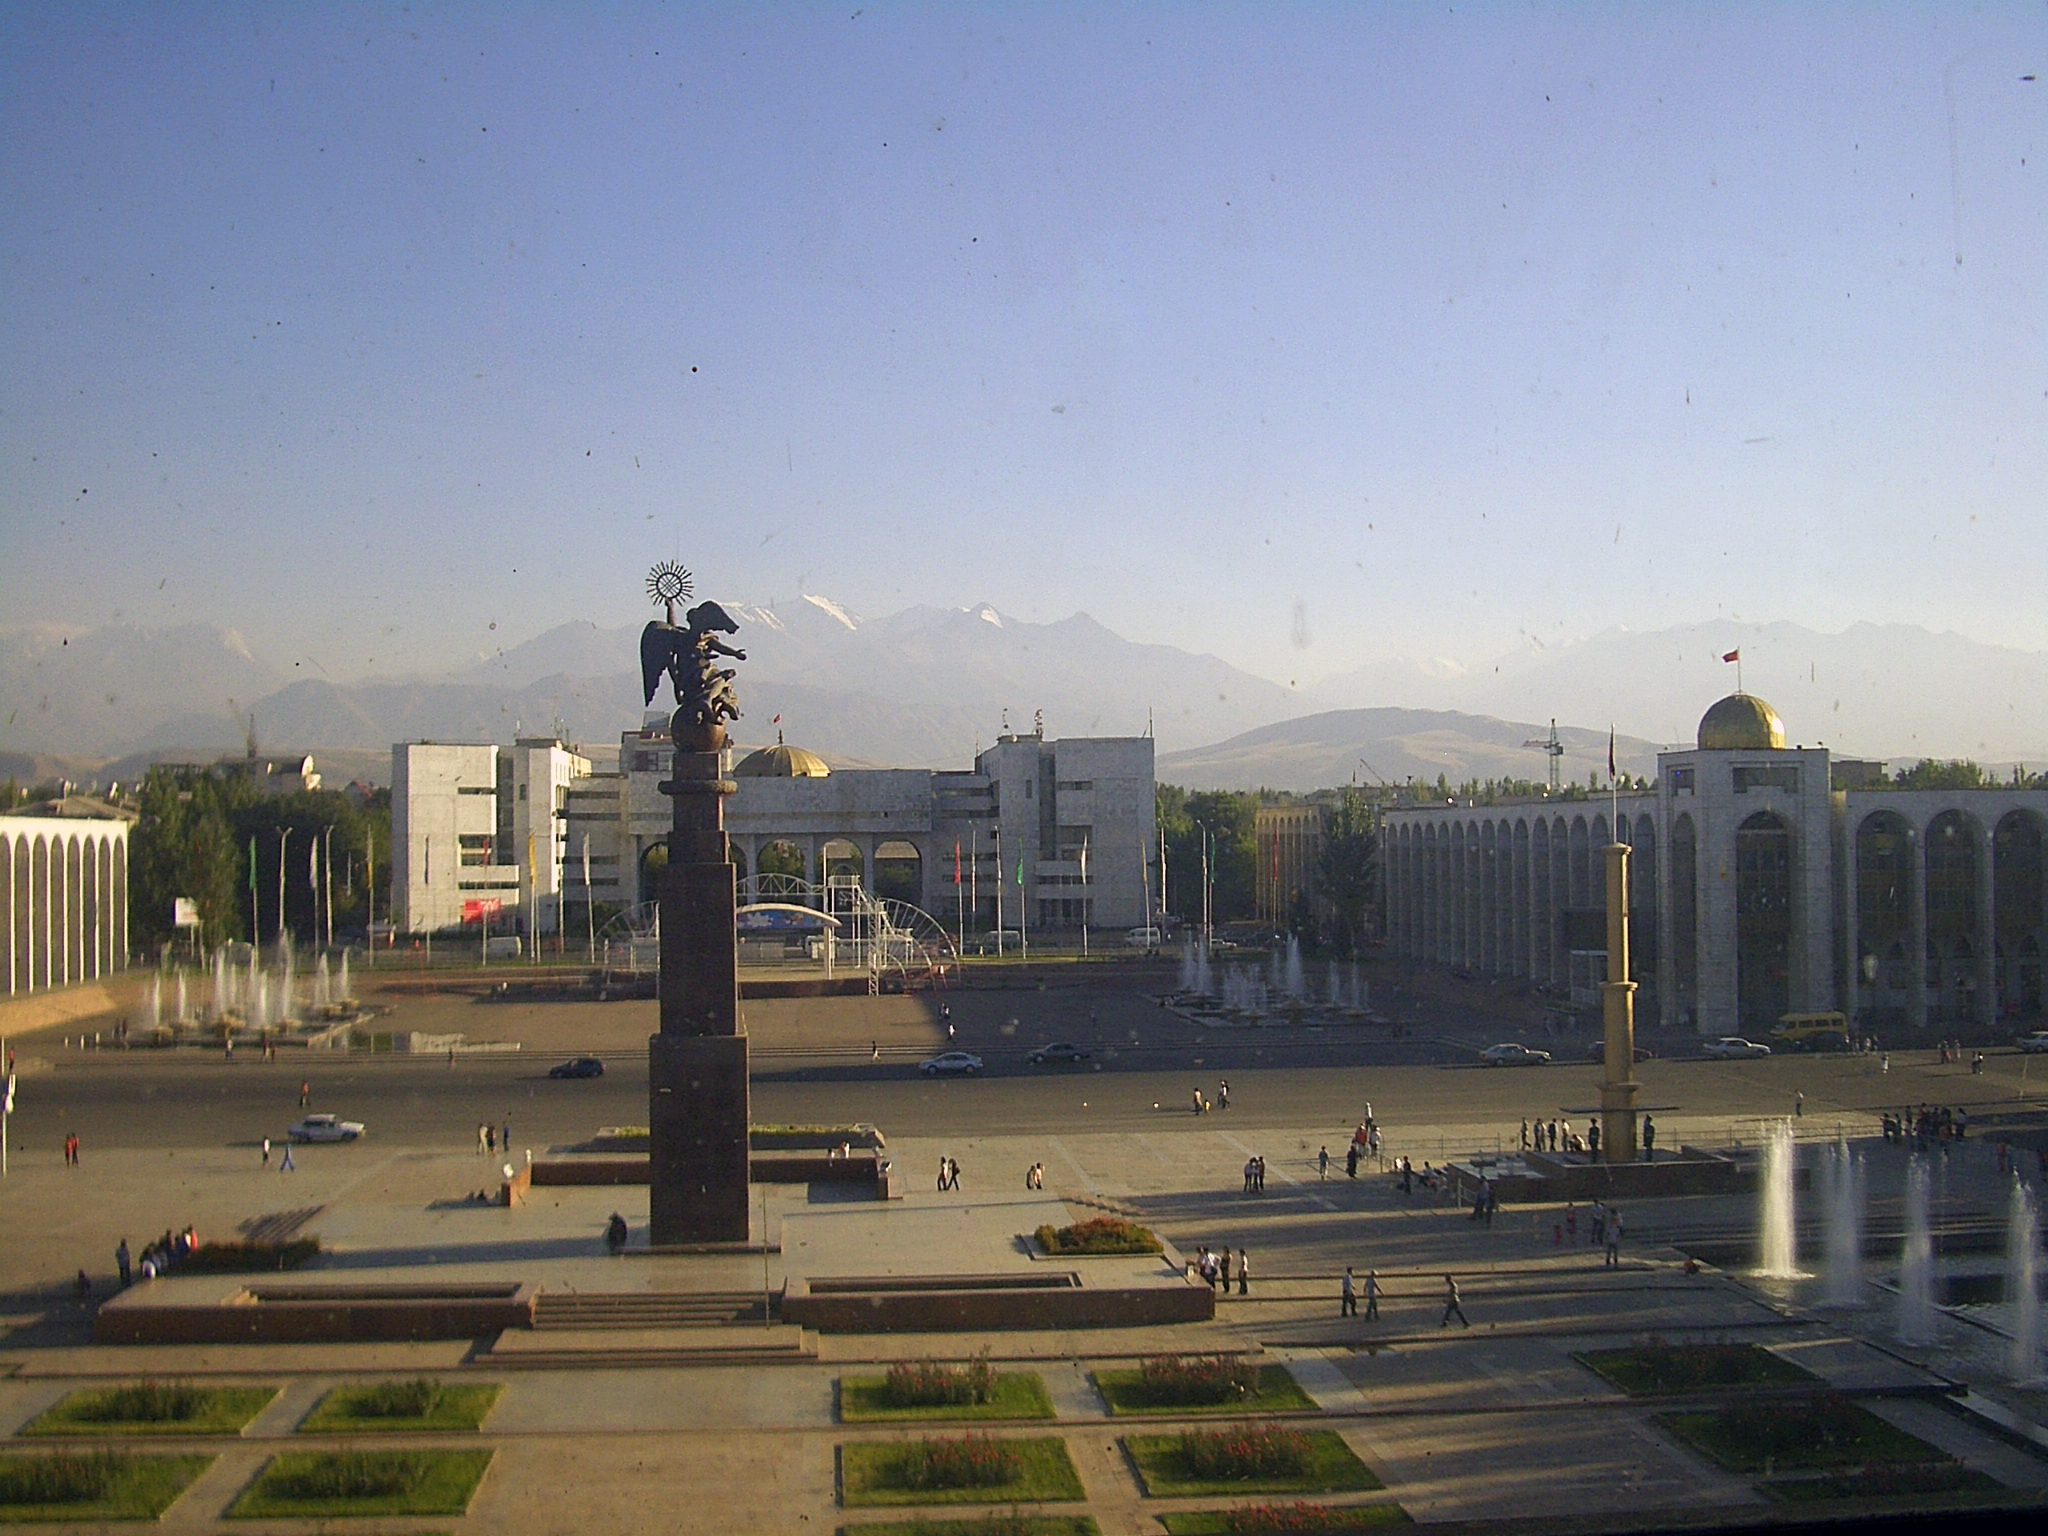 Bishkek Dating Bishkek Singles Bishkek Personals